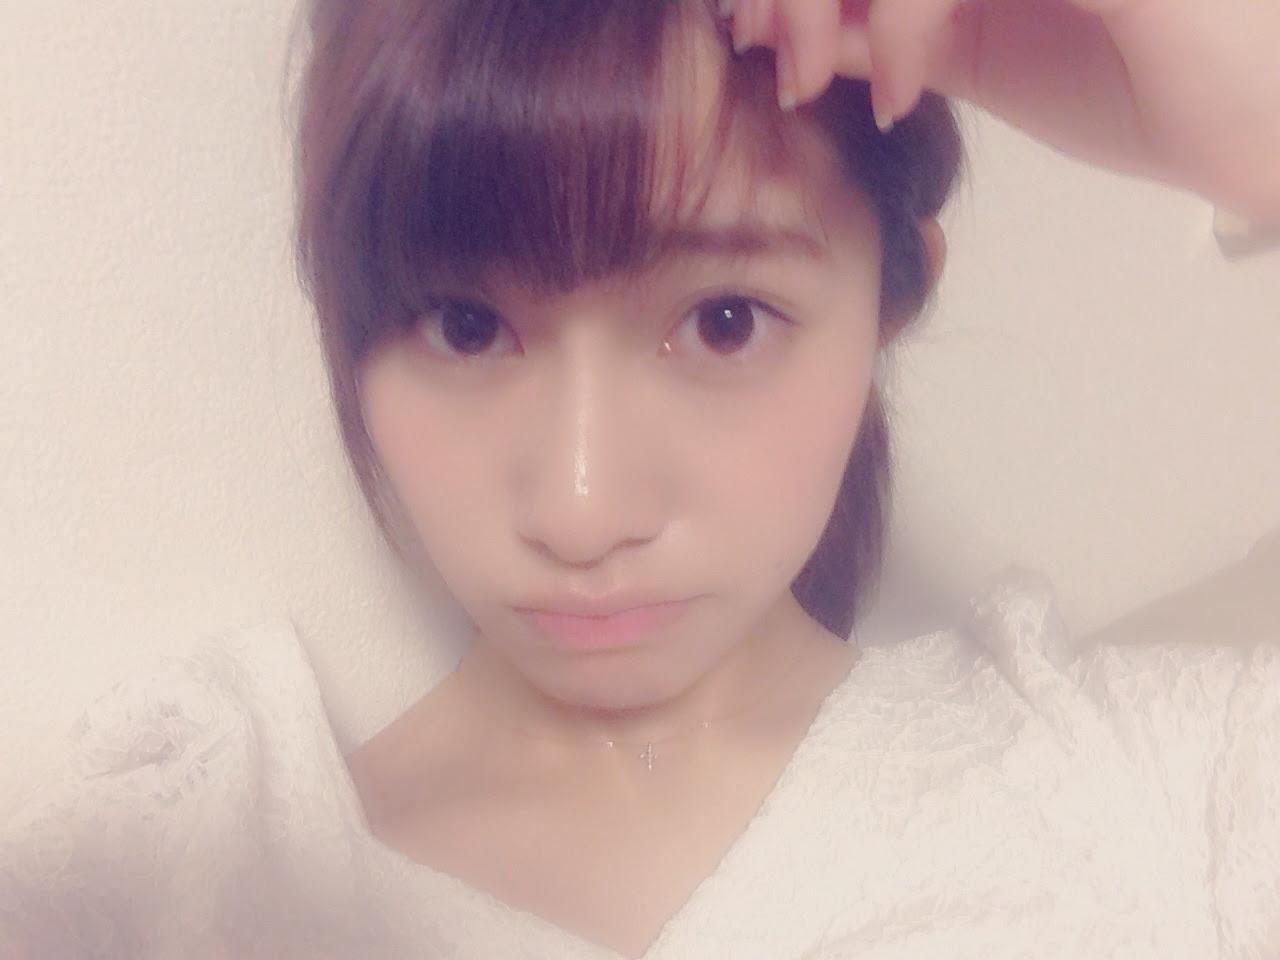 A Pop Idols 140838 Sakurai Reika Nogizaka46 桜井玲香 乃木坂46